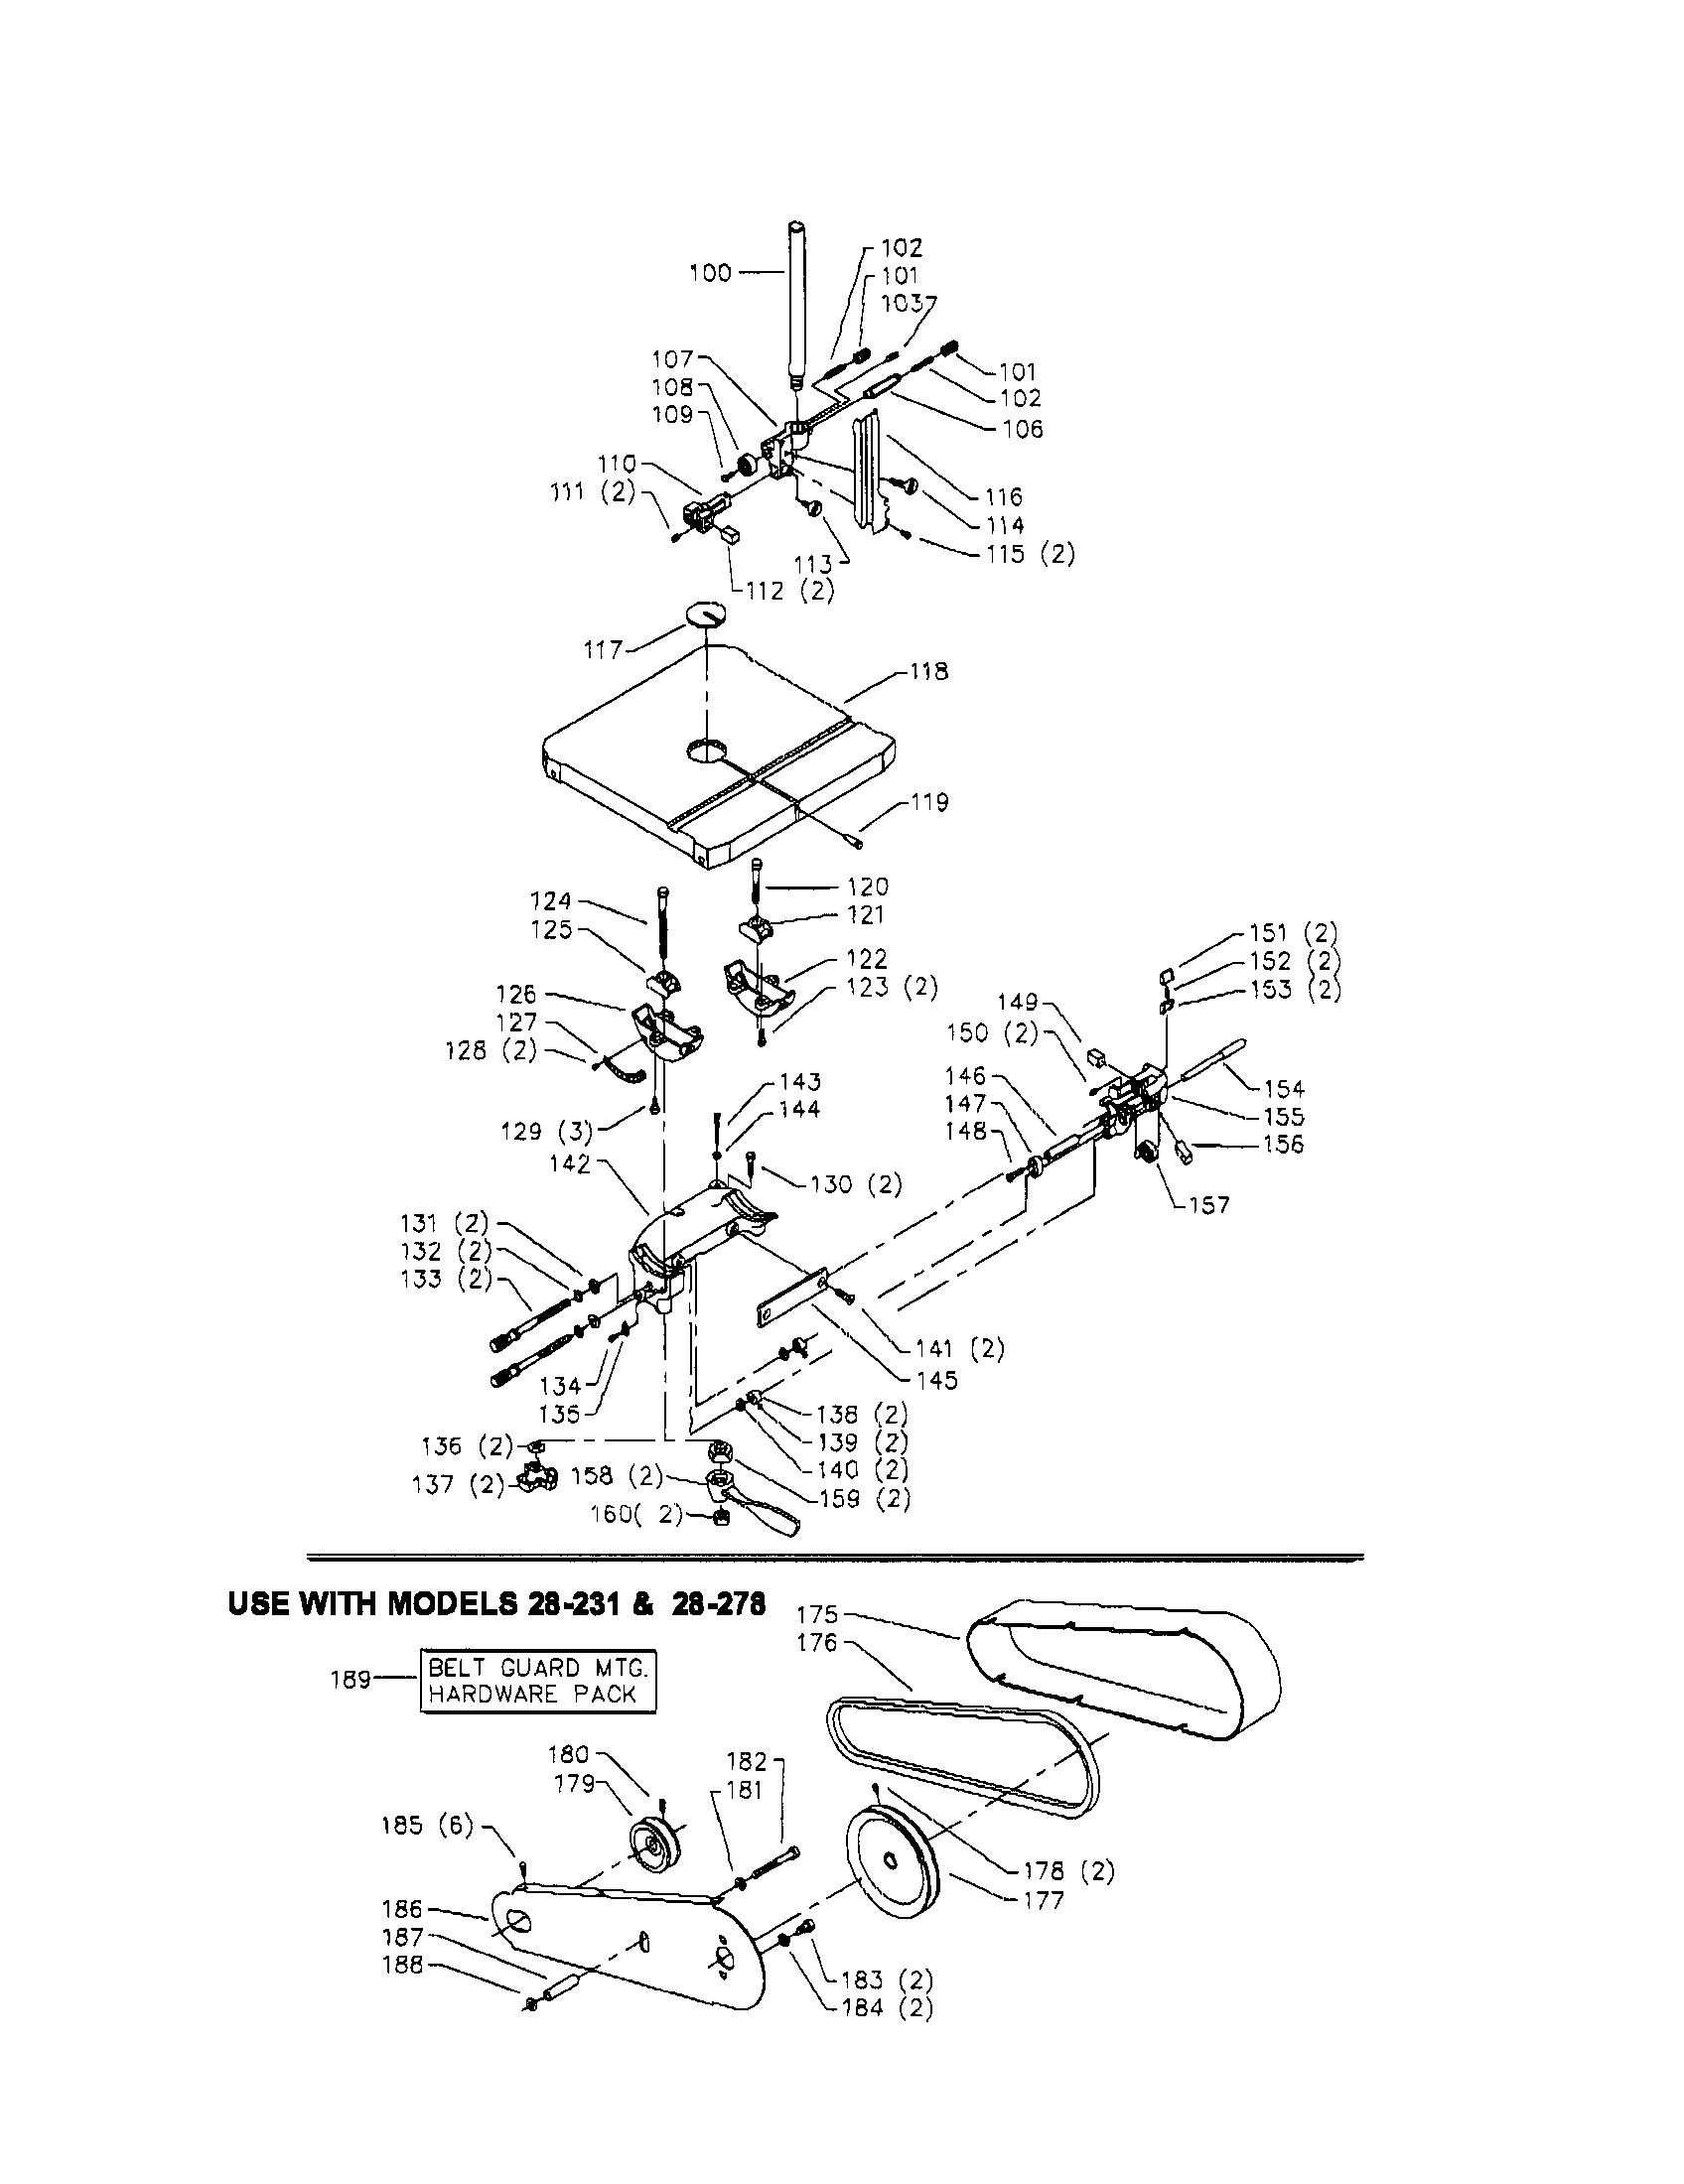 Delta model 28-278 band saw genuine parts